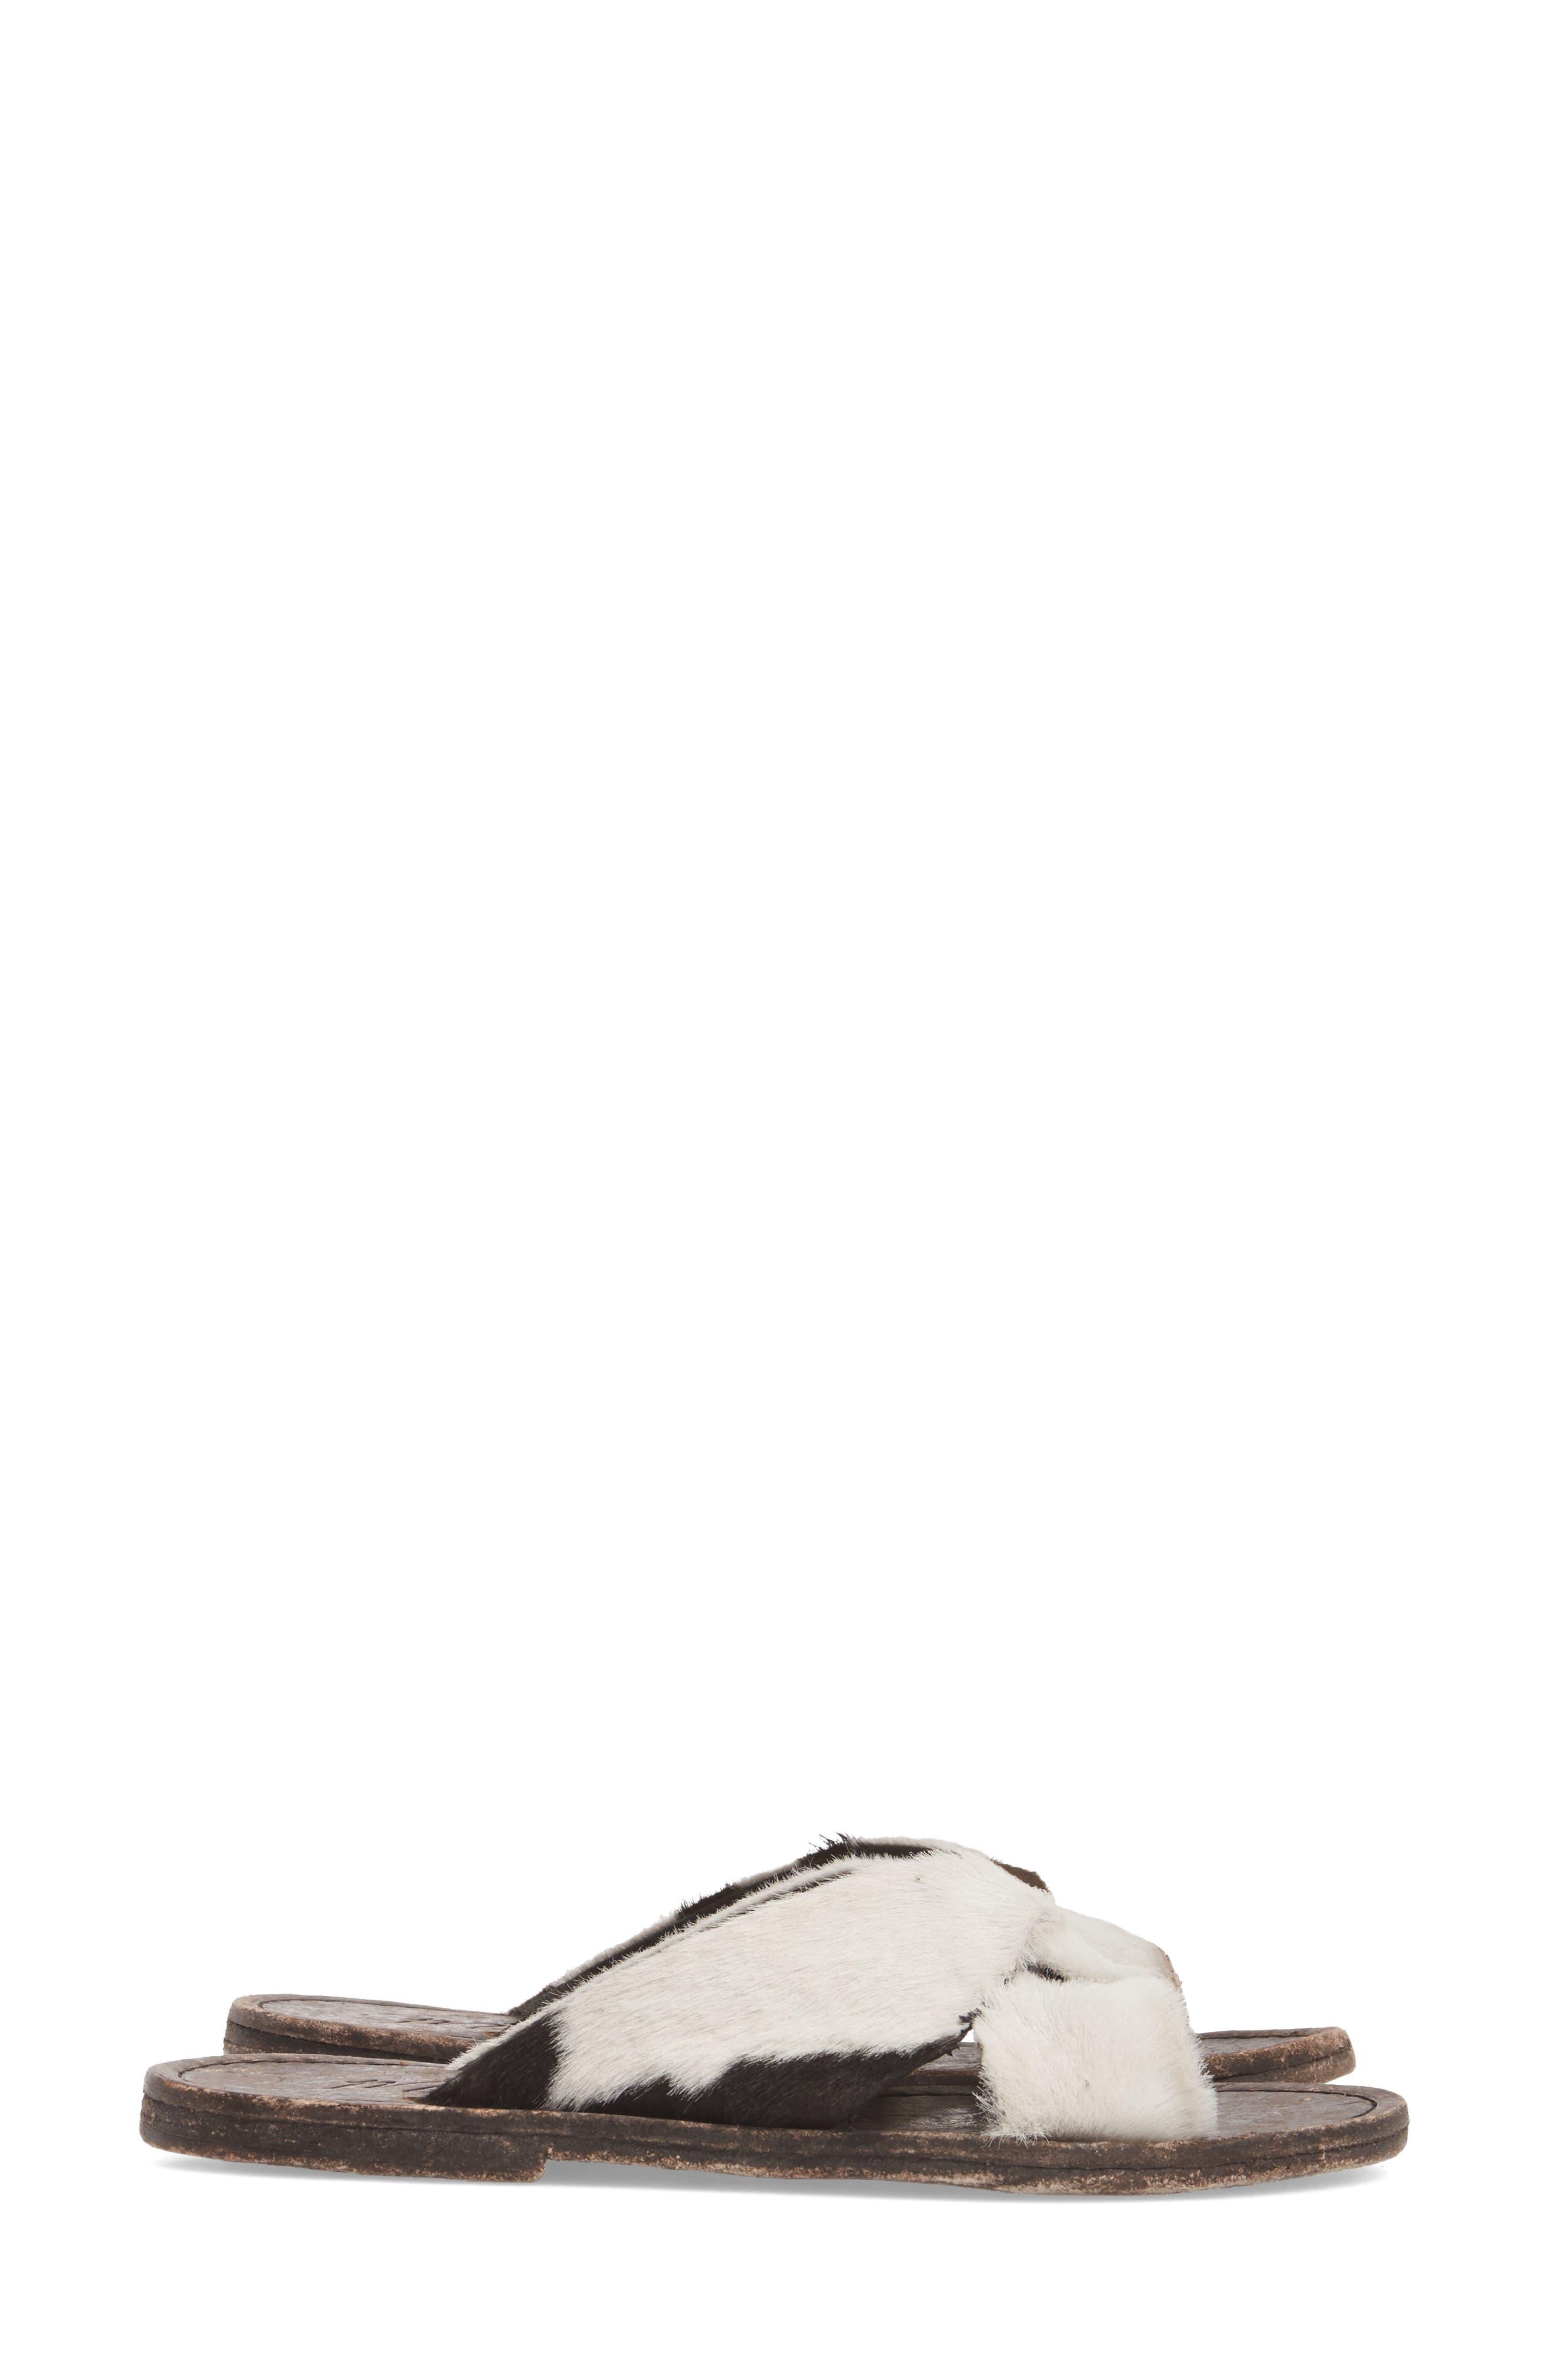 Alamosa Genuine Calf Hair Sandal,                             Alternate thumbnail 3, color,                             Black/ White